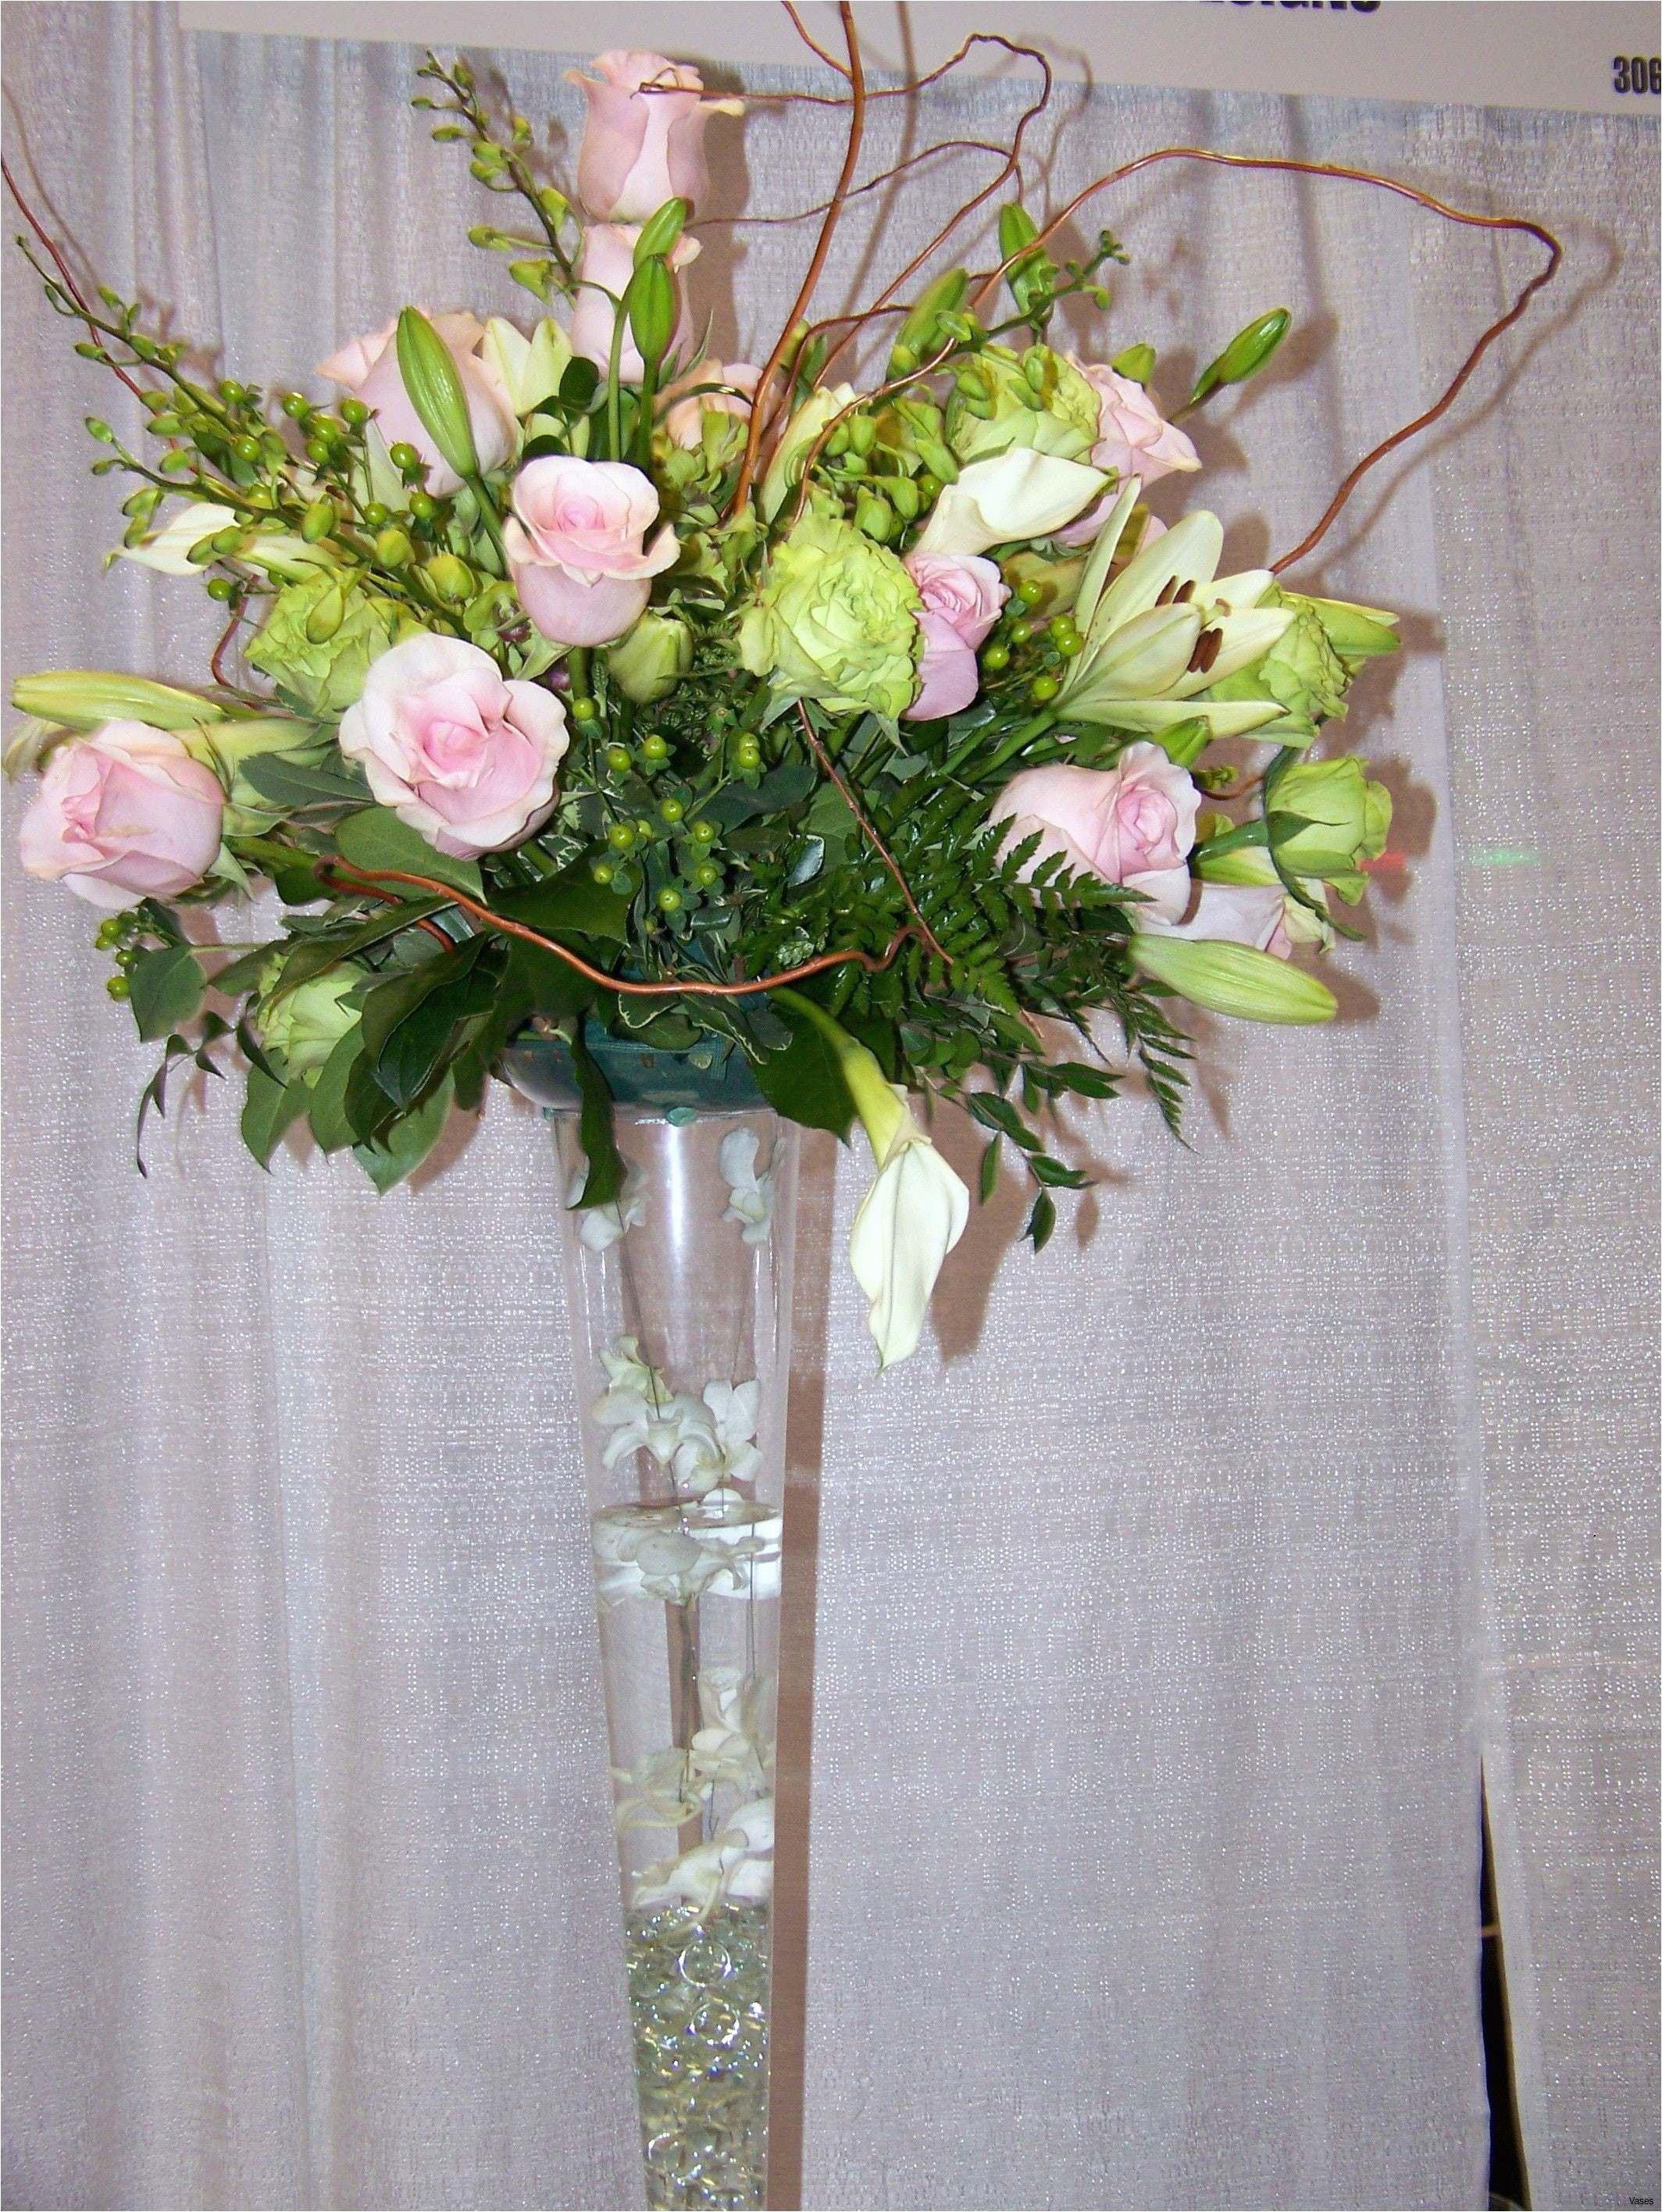 unity vase set of 19 wedding reception venues st charles mo illustrations wedding zone for garden wedding reception contemporary 30 unique outdoor wedding